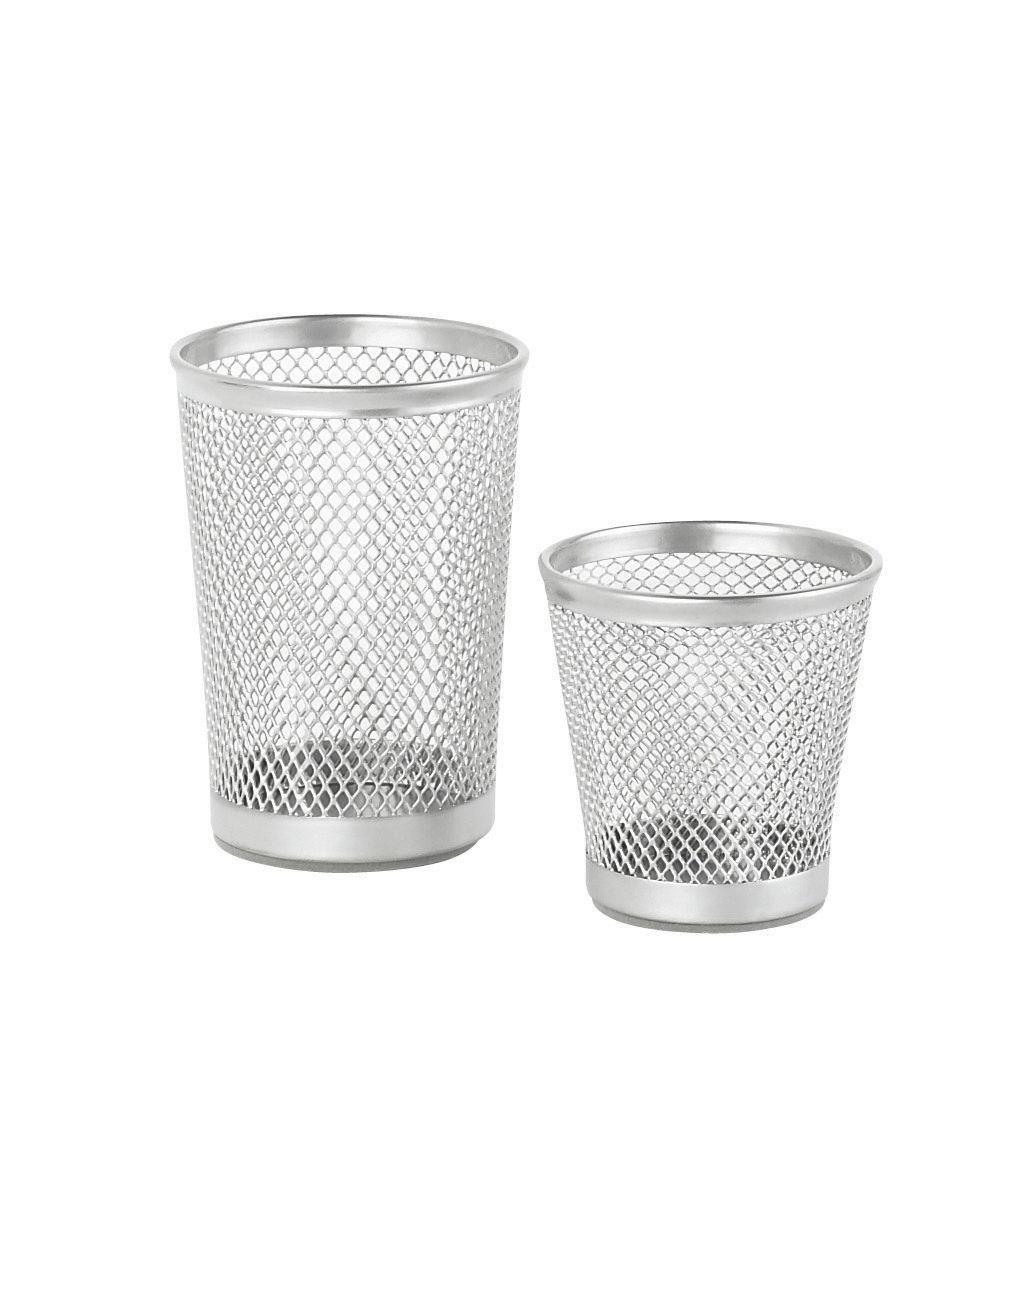 Stiftehalter Mesh in Silber - Silberfarben, Basics, Metall (7cm) - X-MAS